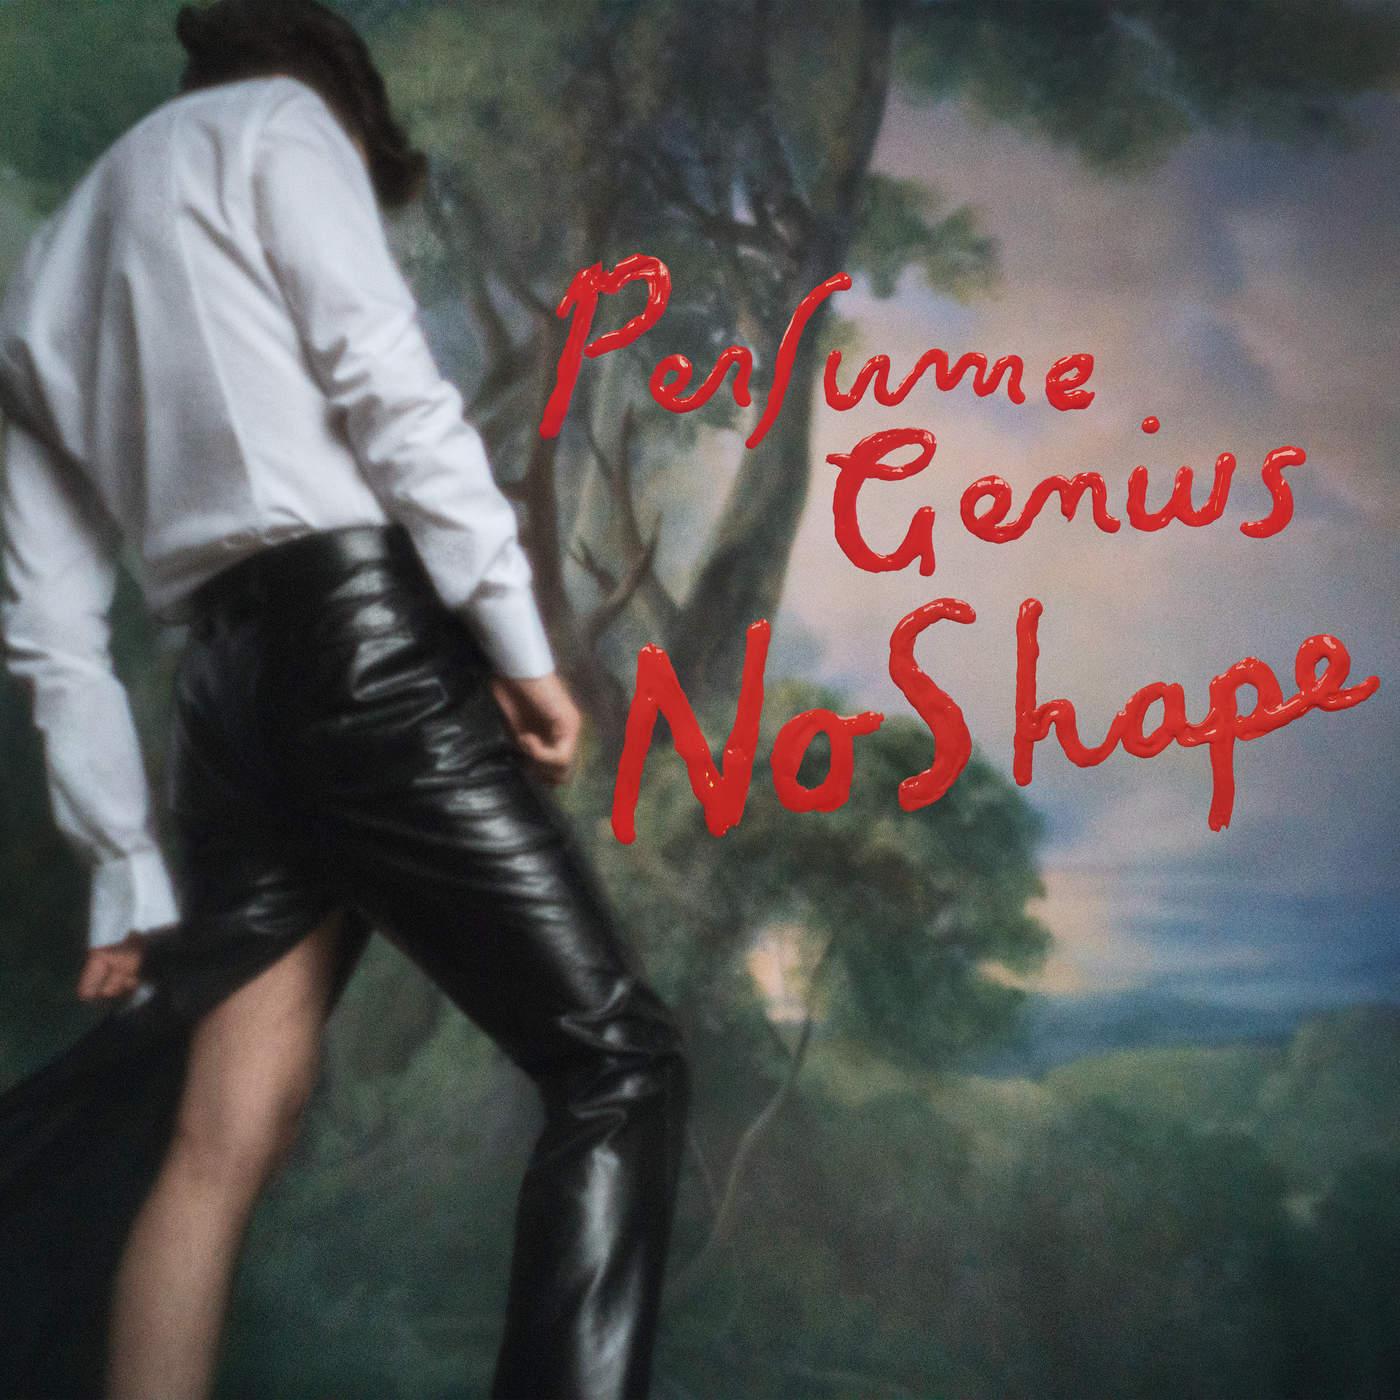 Perfume Genius - No Shape Cover